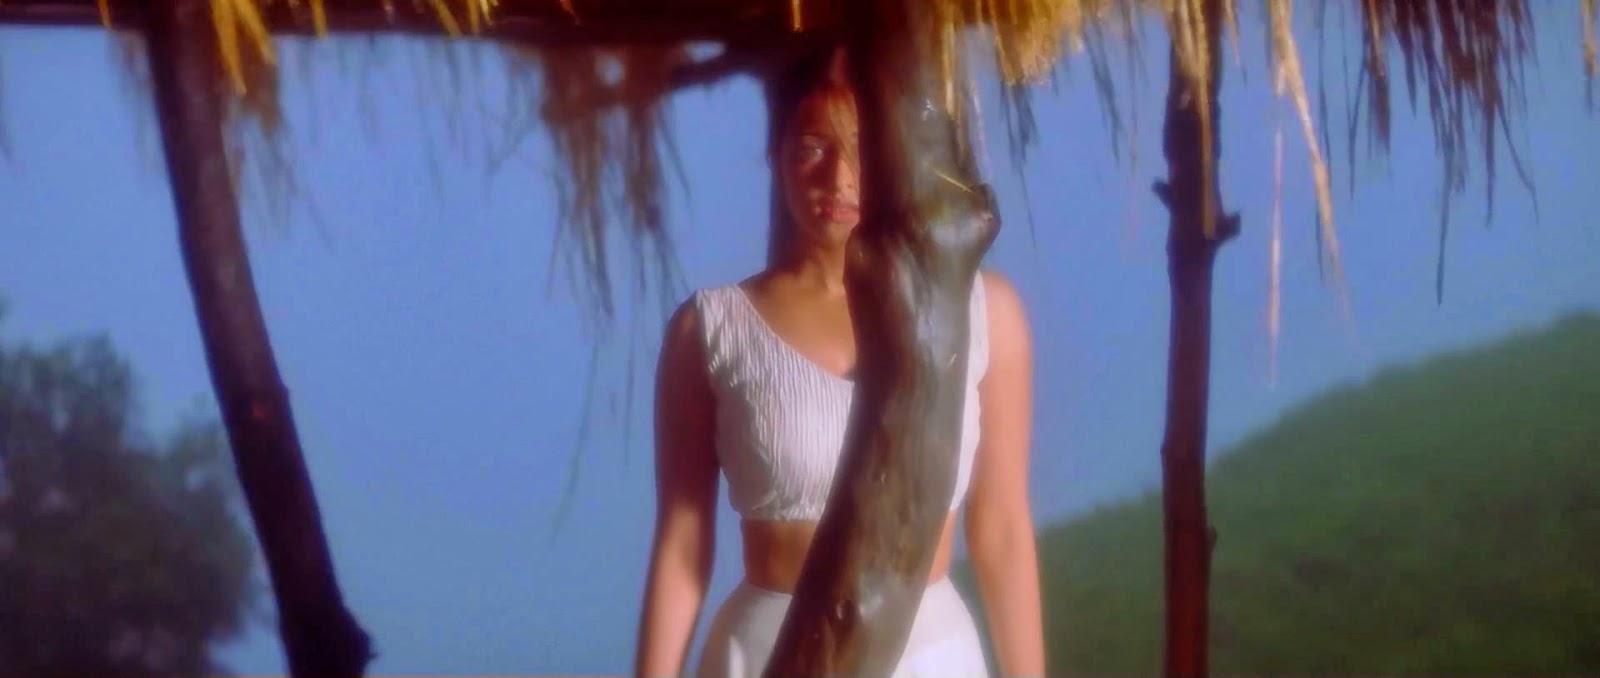 Taal (1999) - 1080p - WEBHD-Rip - x264 - AC3 5.1 - All VideoS [DrC] - Multi-Links